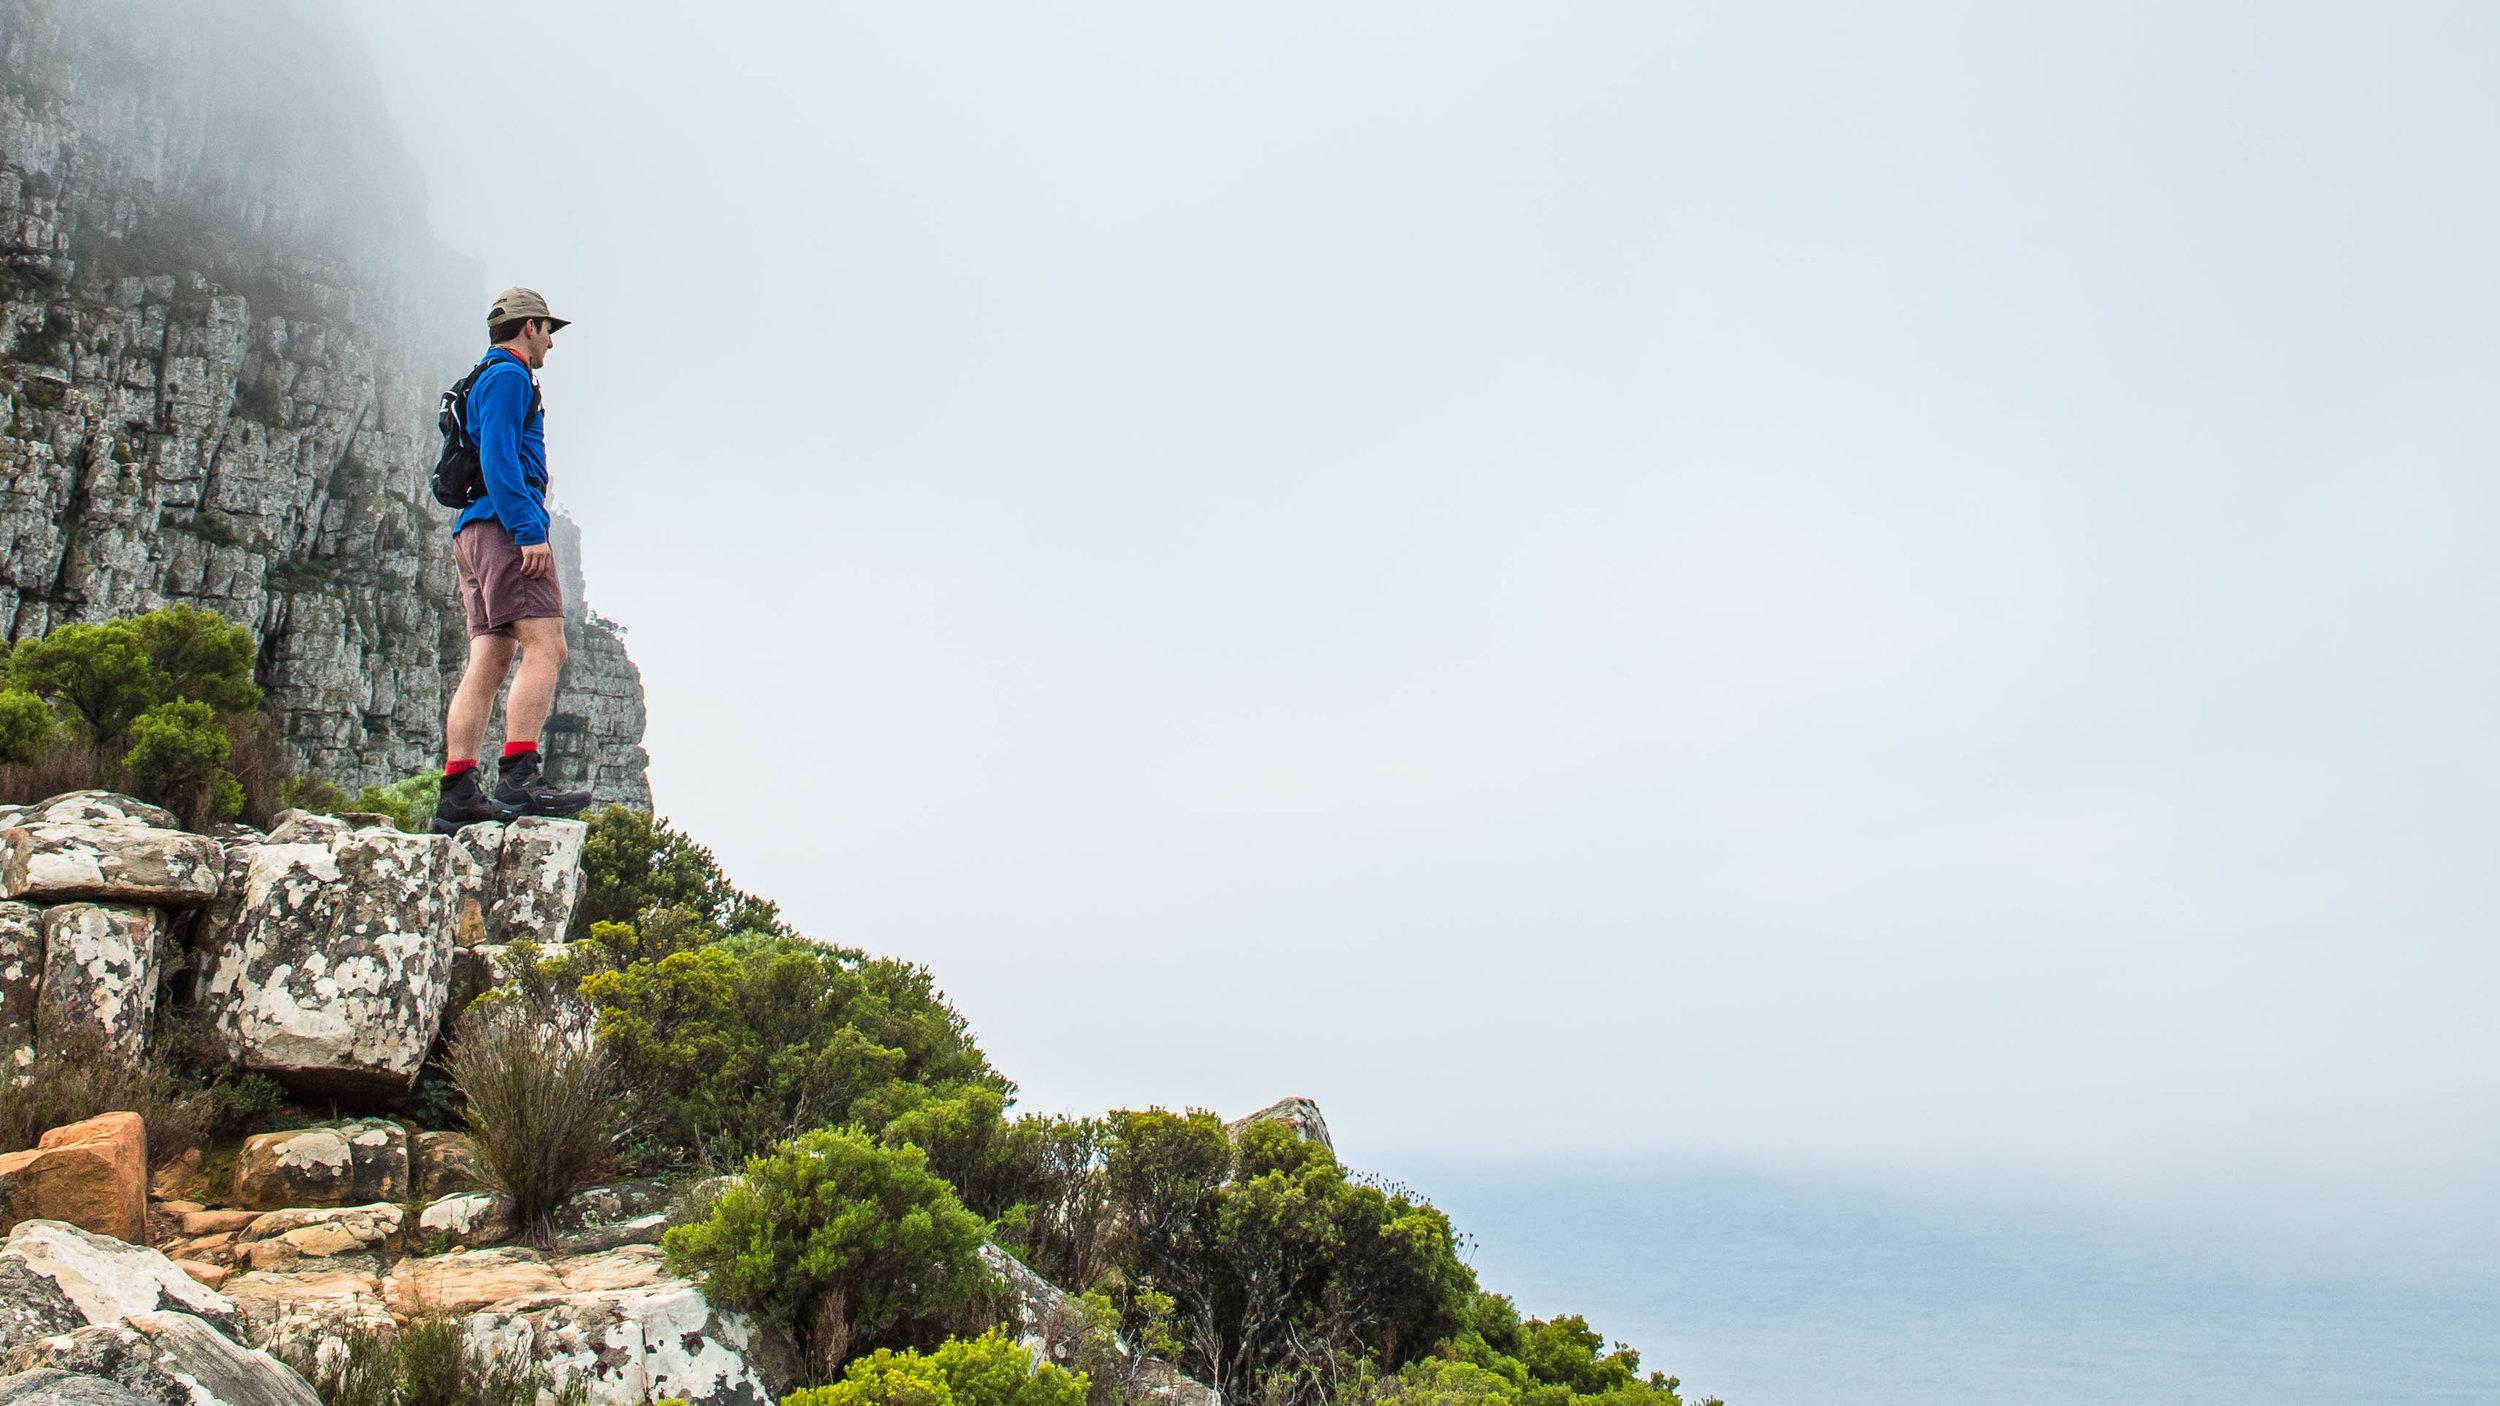 hiking-lions-head-cape-town-chris-davies.jpg